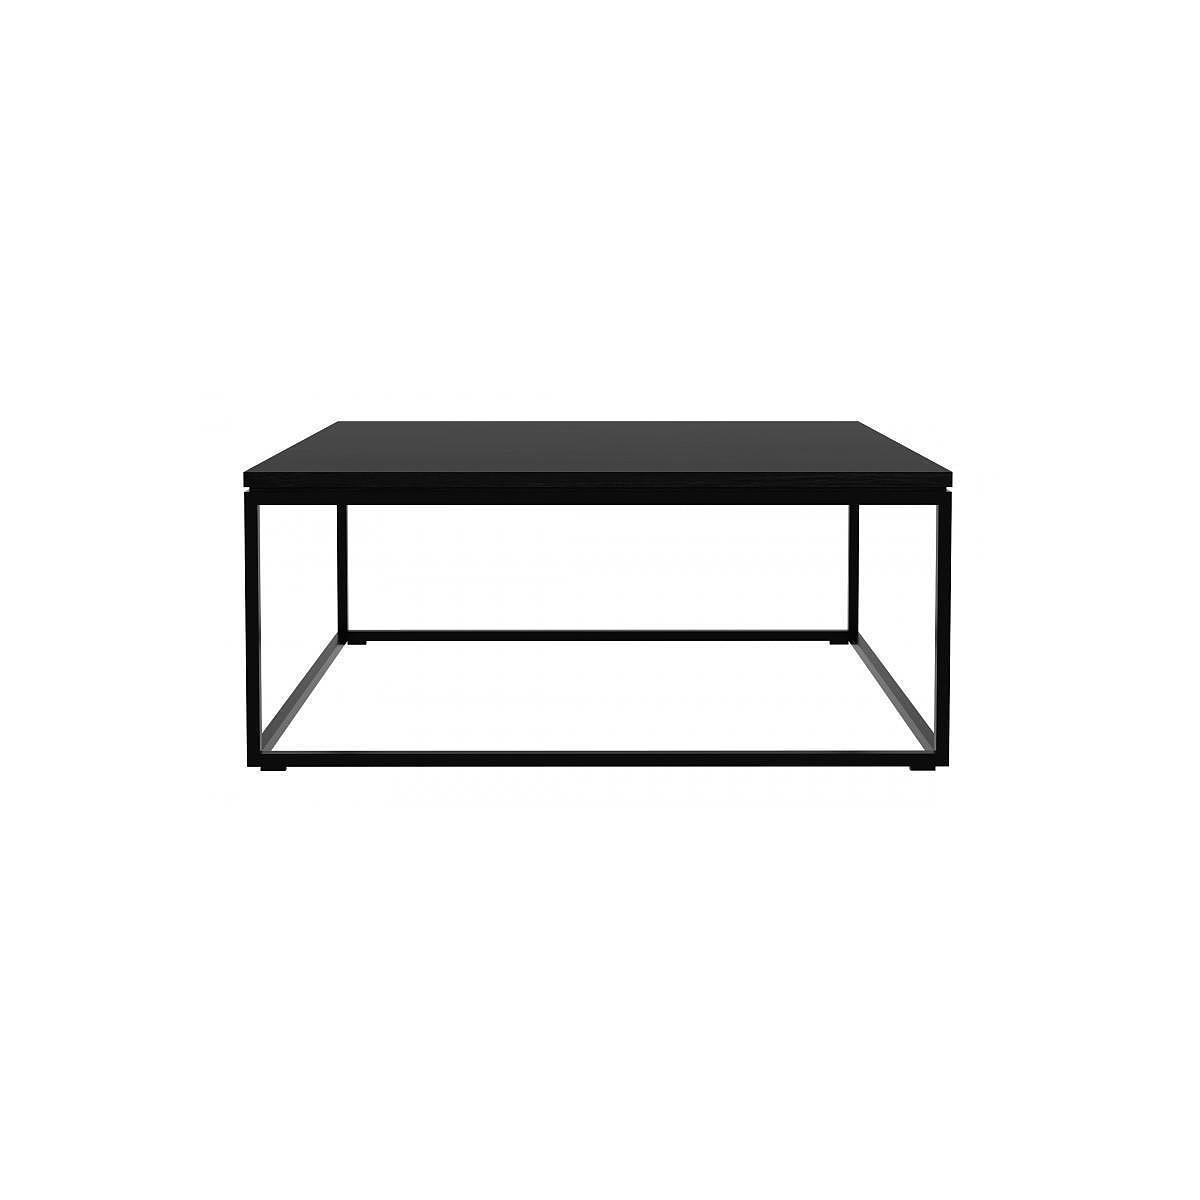 Table basse THIN Ethnicraft chêne teinté noir